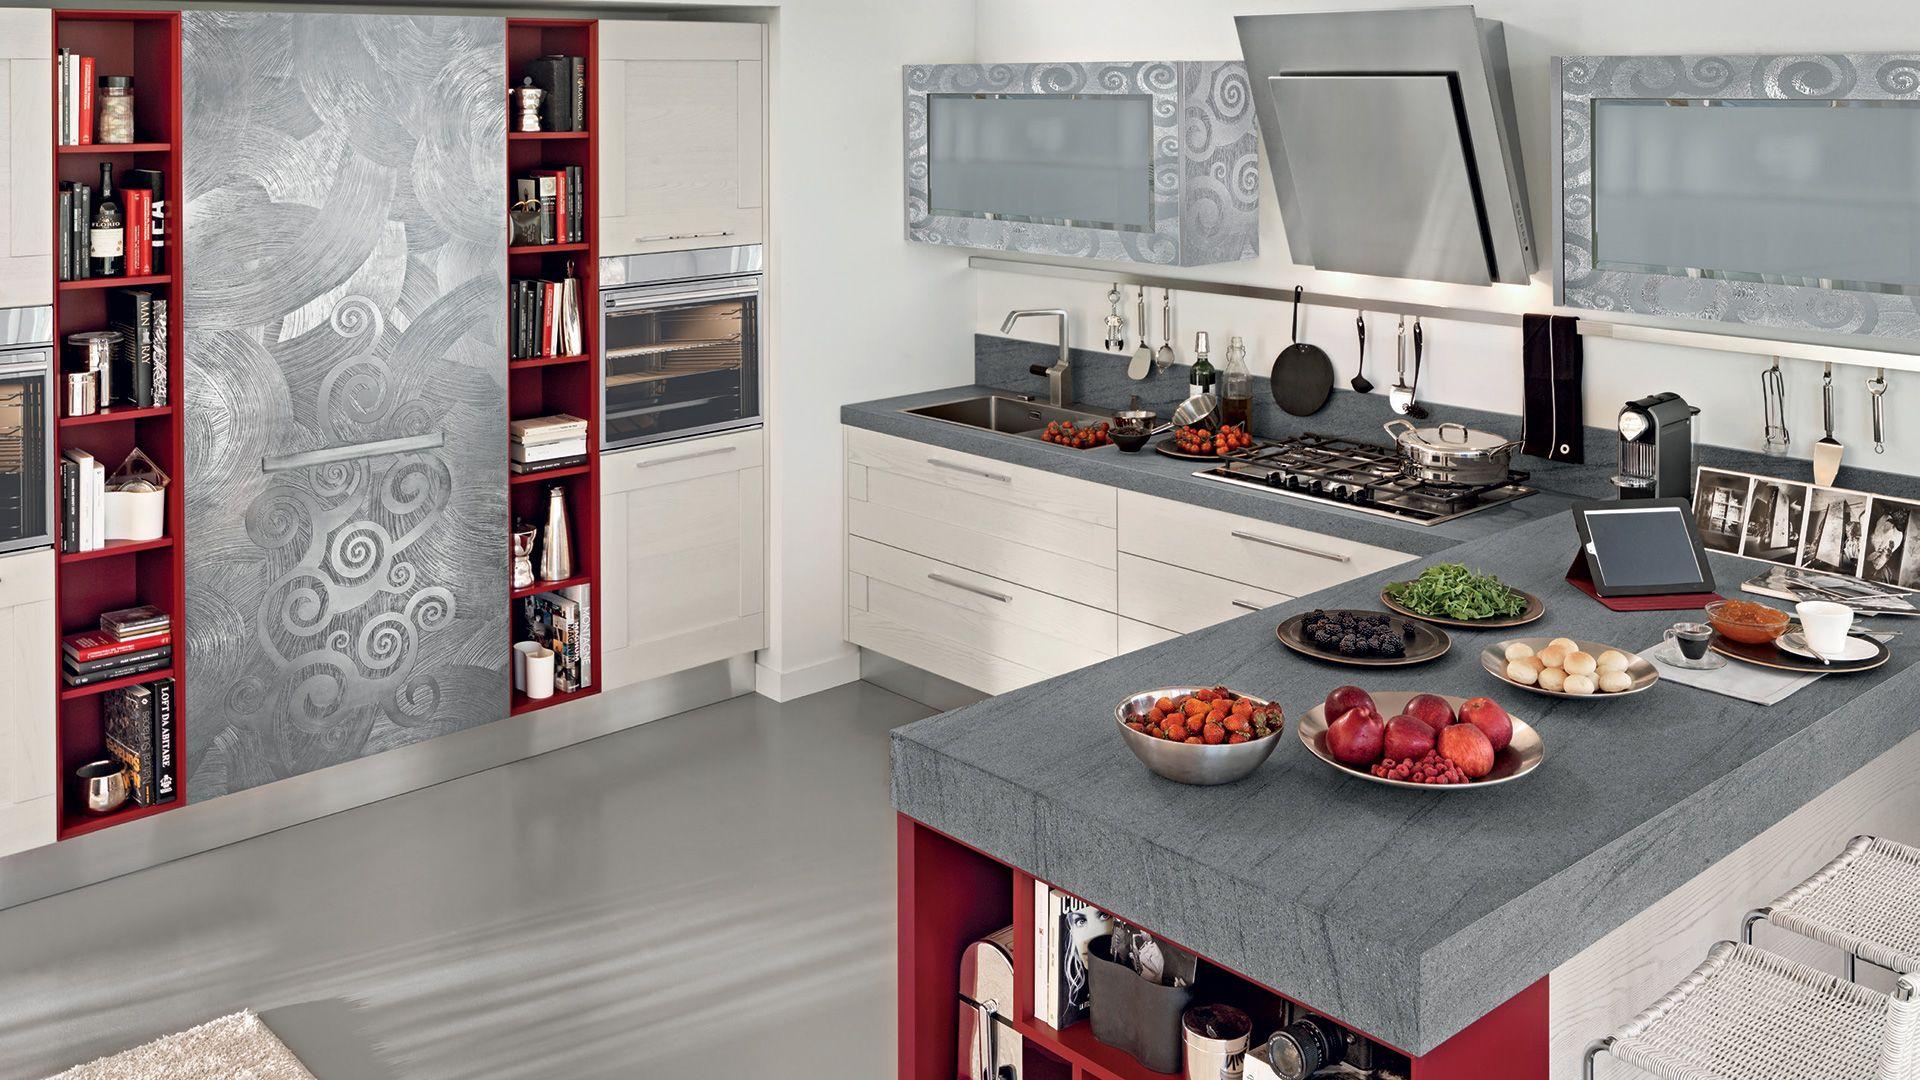 Gallery - Cucine Moderne - Cucine Lube | ...Wonderful ...